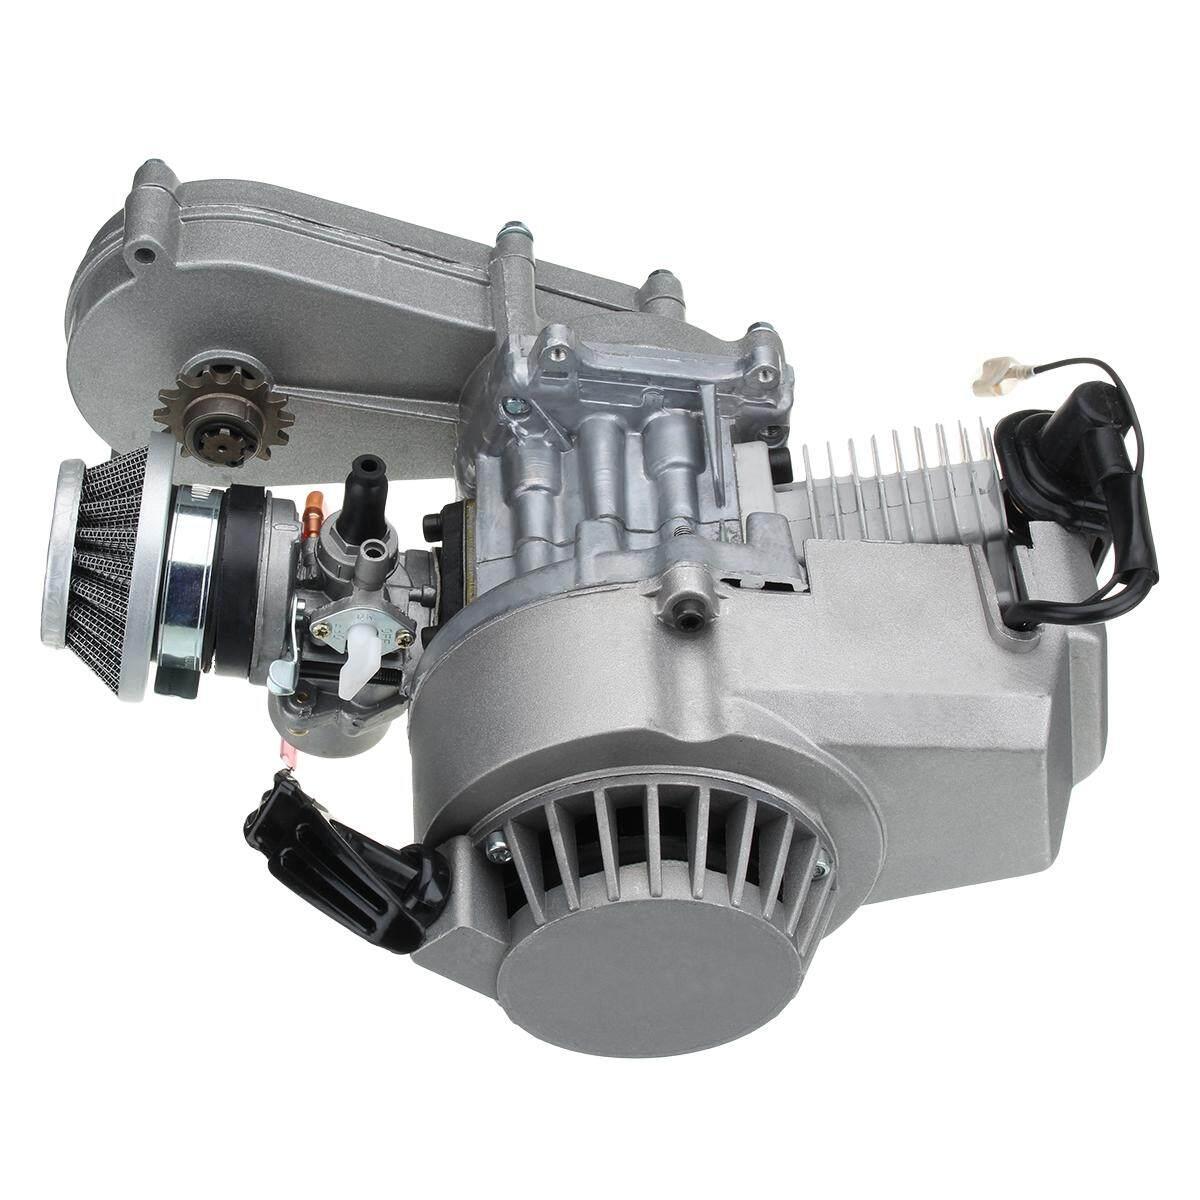 Gearbox 49cc MINI Moto MINI Moto Kotoran Sepeda Quad ATV Mesin Karburator Pullstart Coil-Internasional